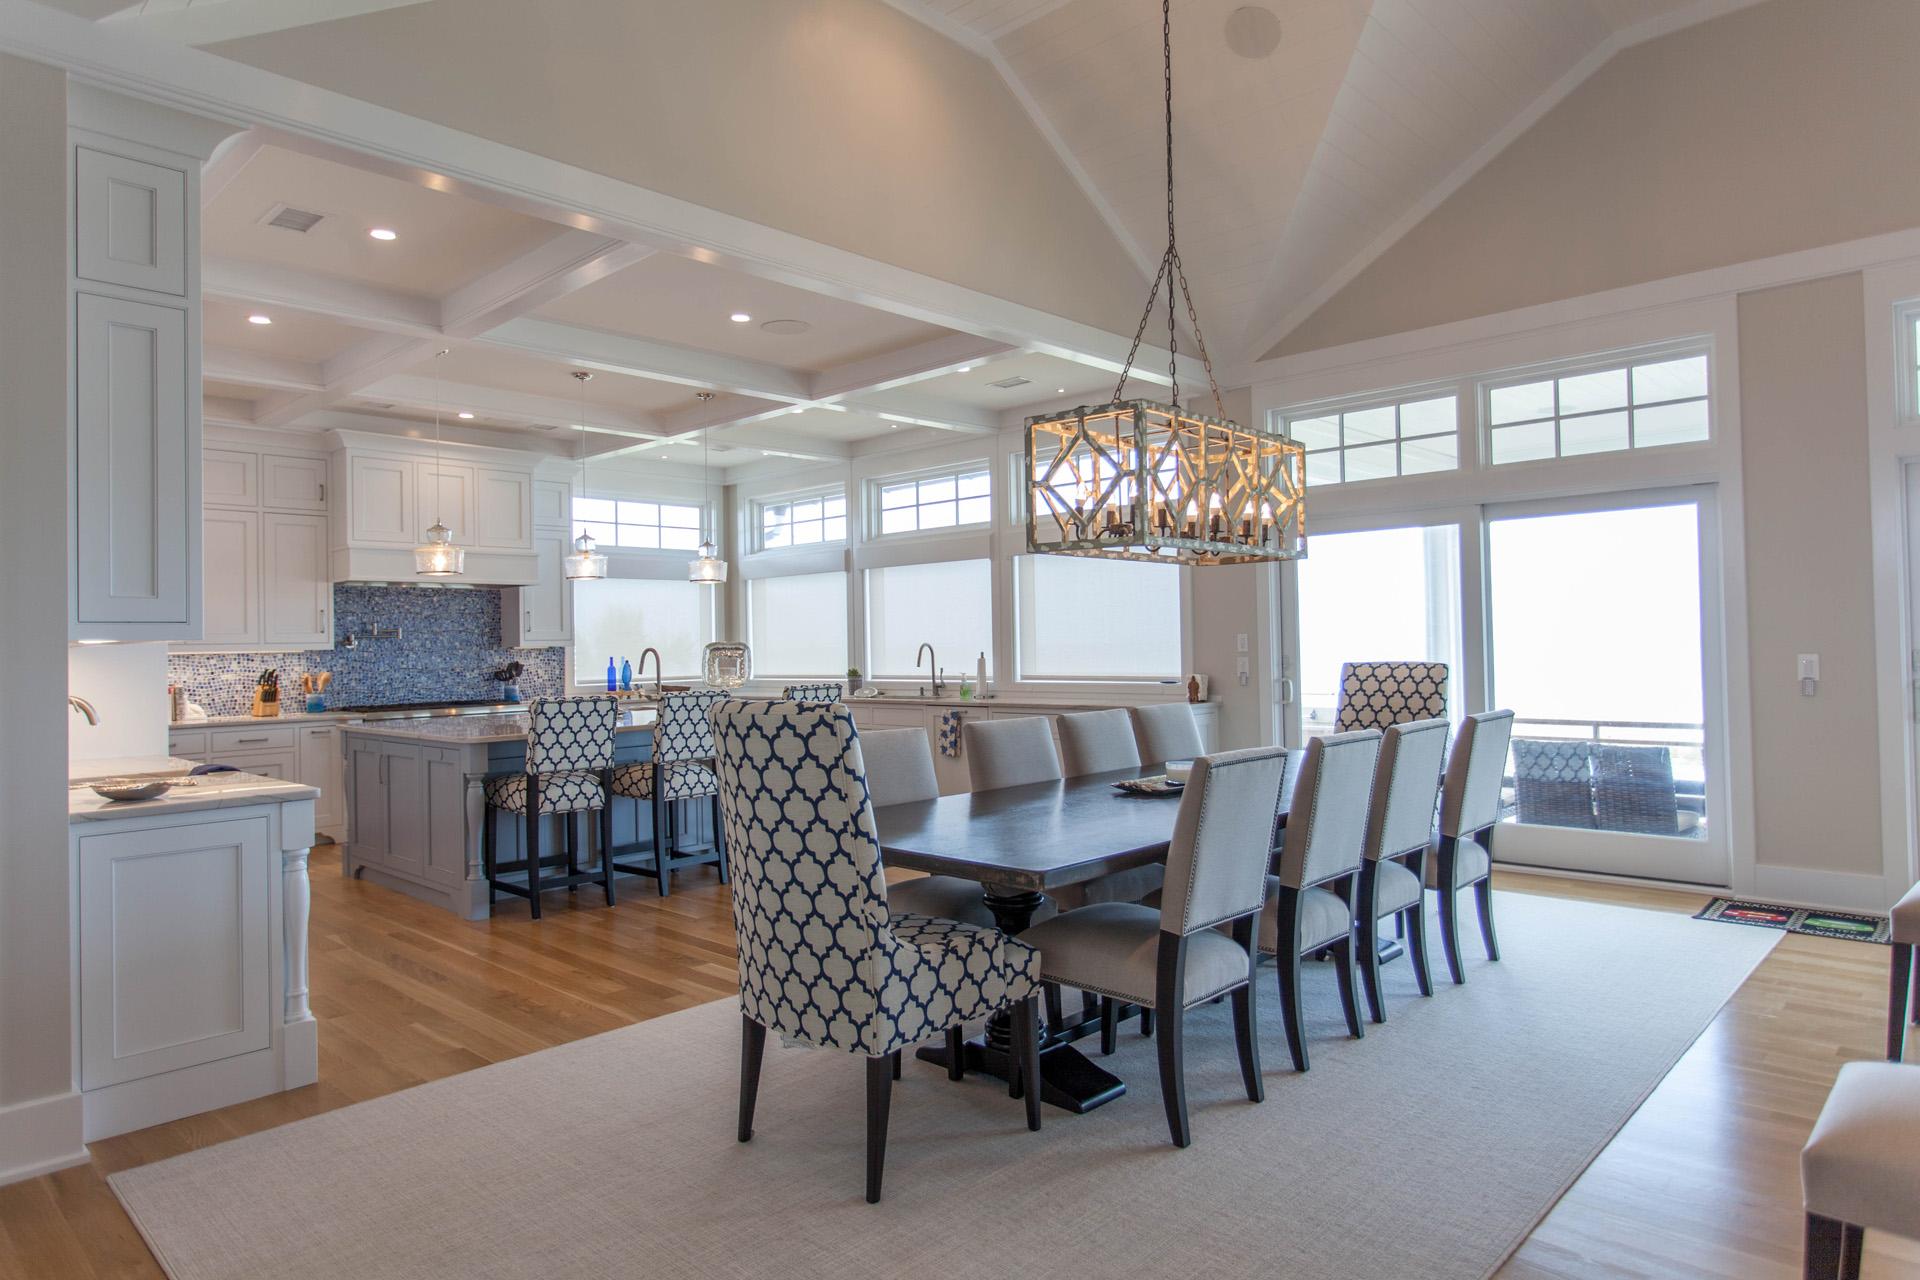 Home Coastal Cabinets